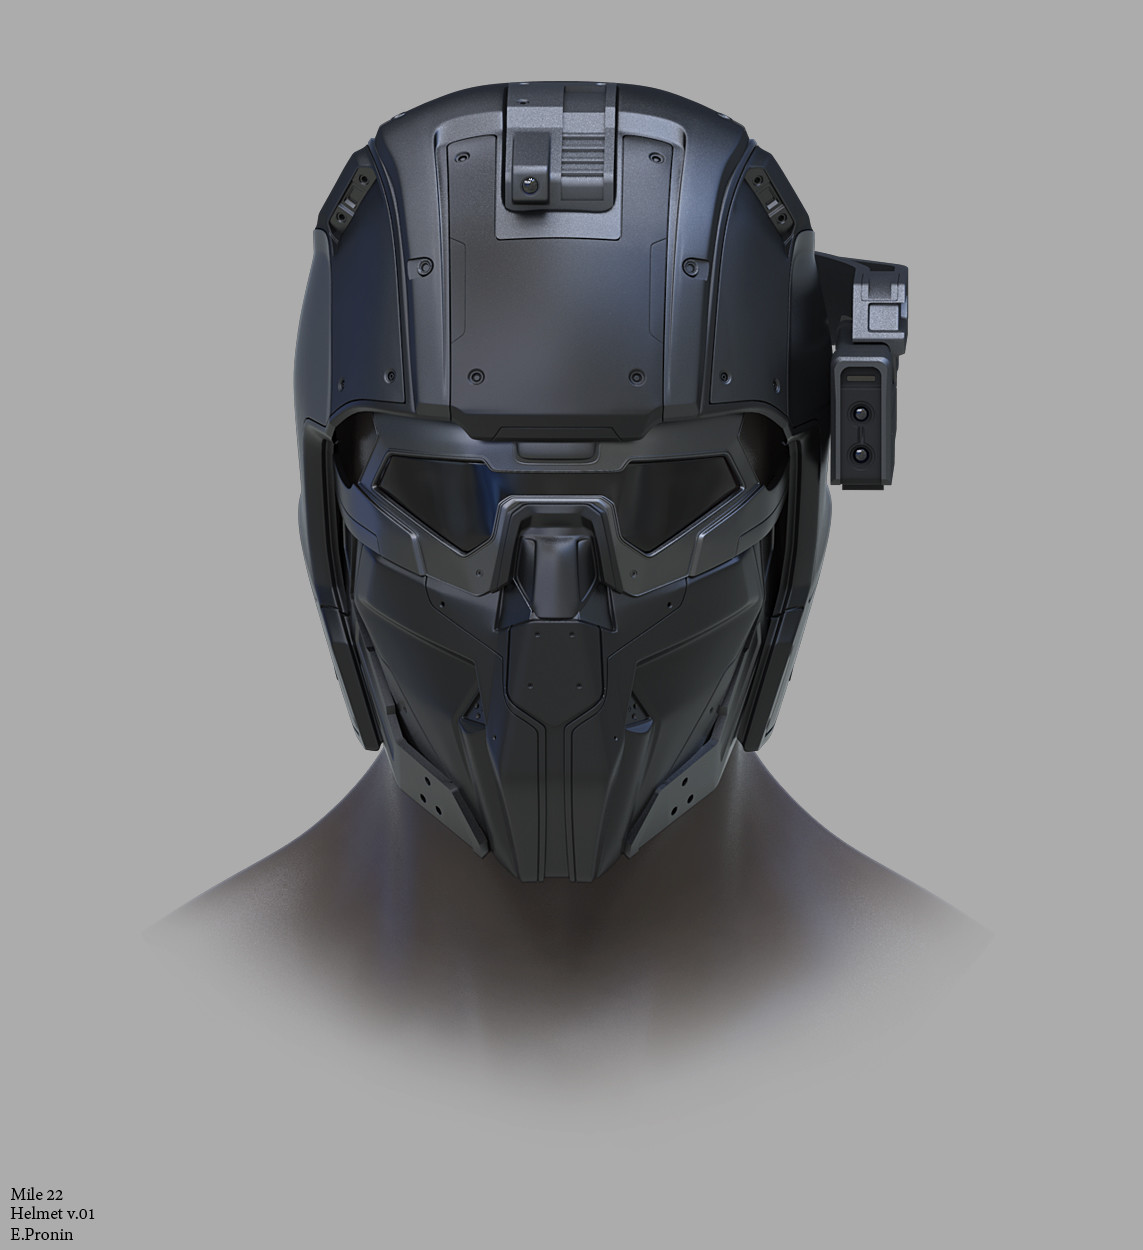 Eduard pronin mile22 helmet concept 02